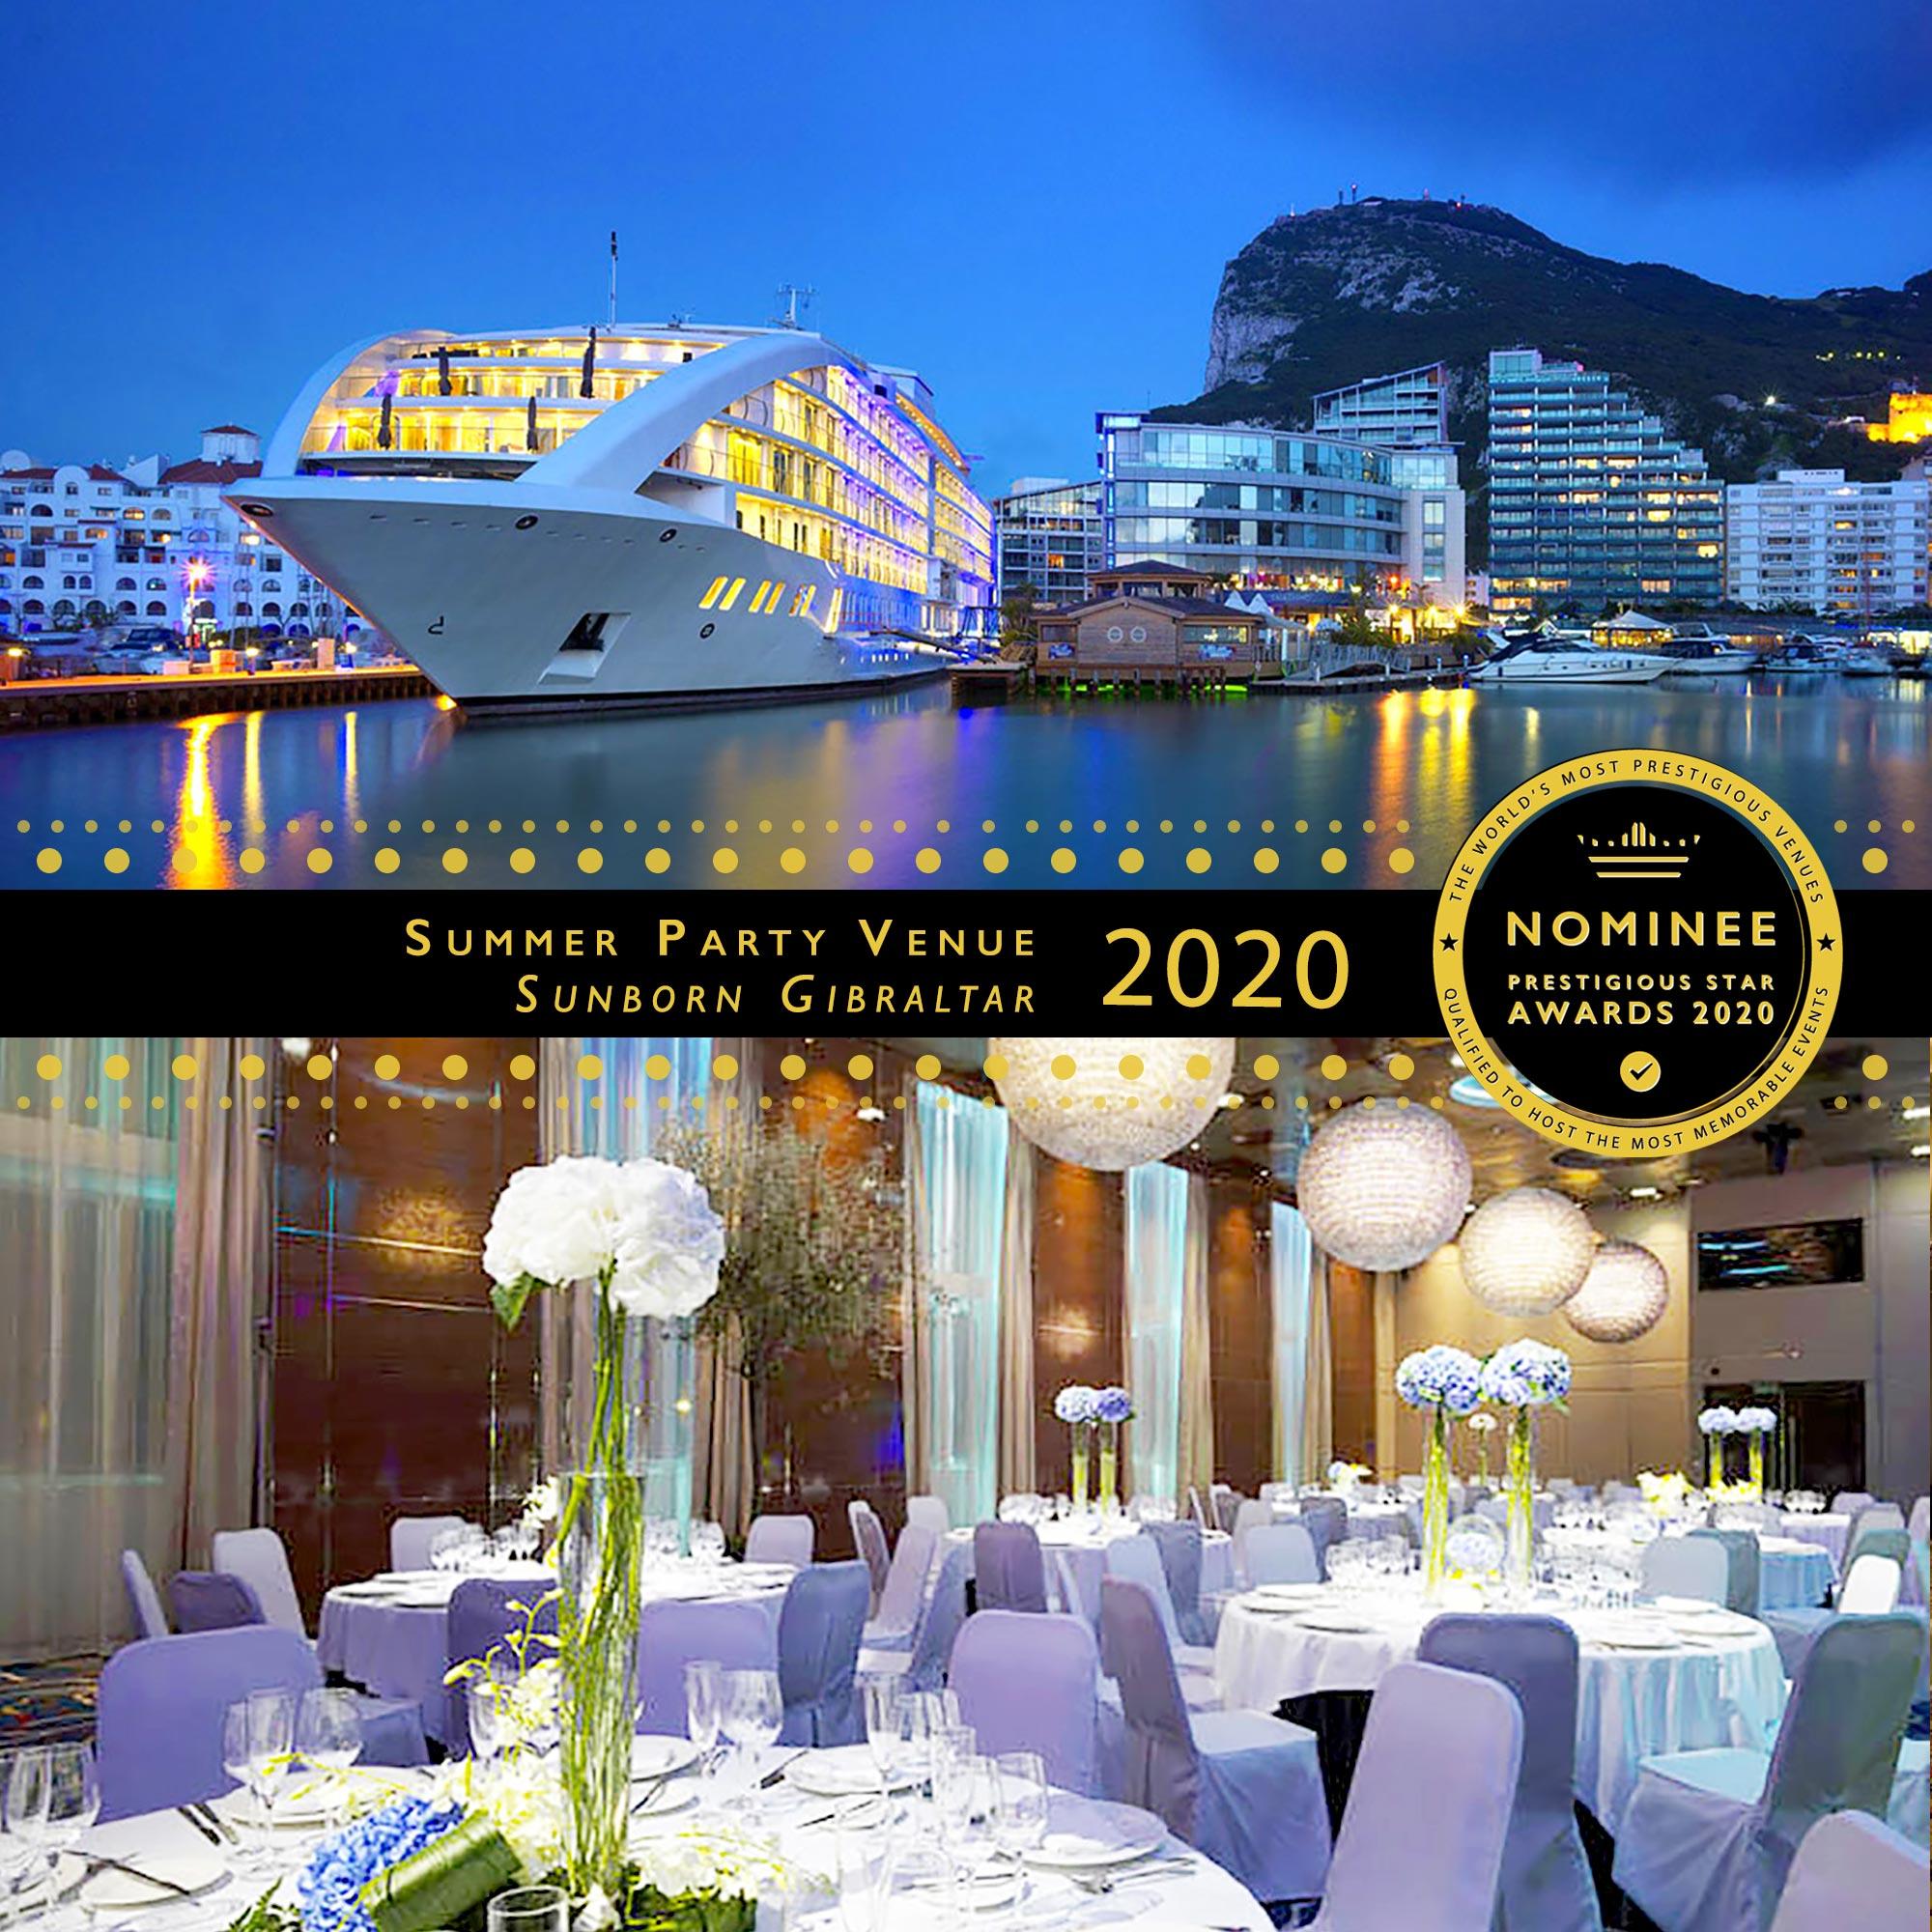 Barbary Restaurant at Sunborn Gibraltar